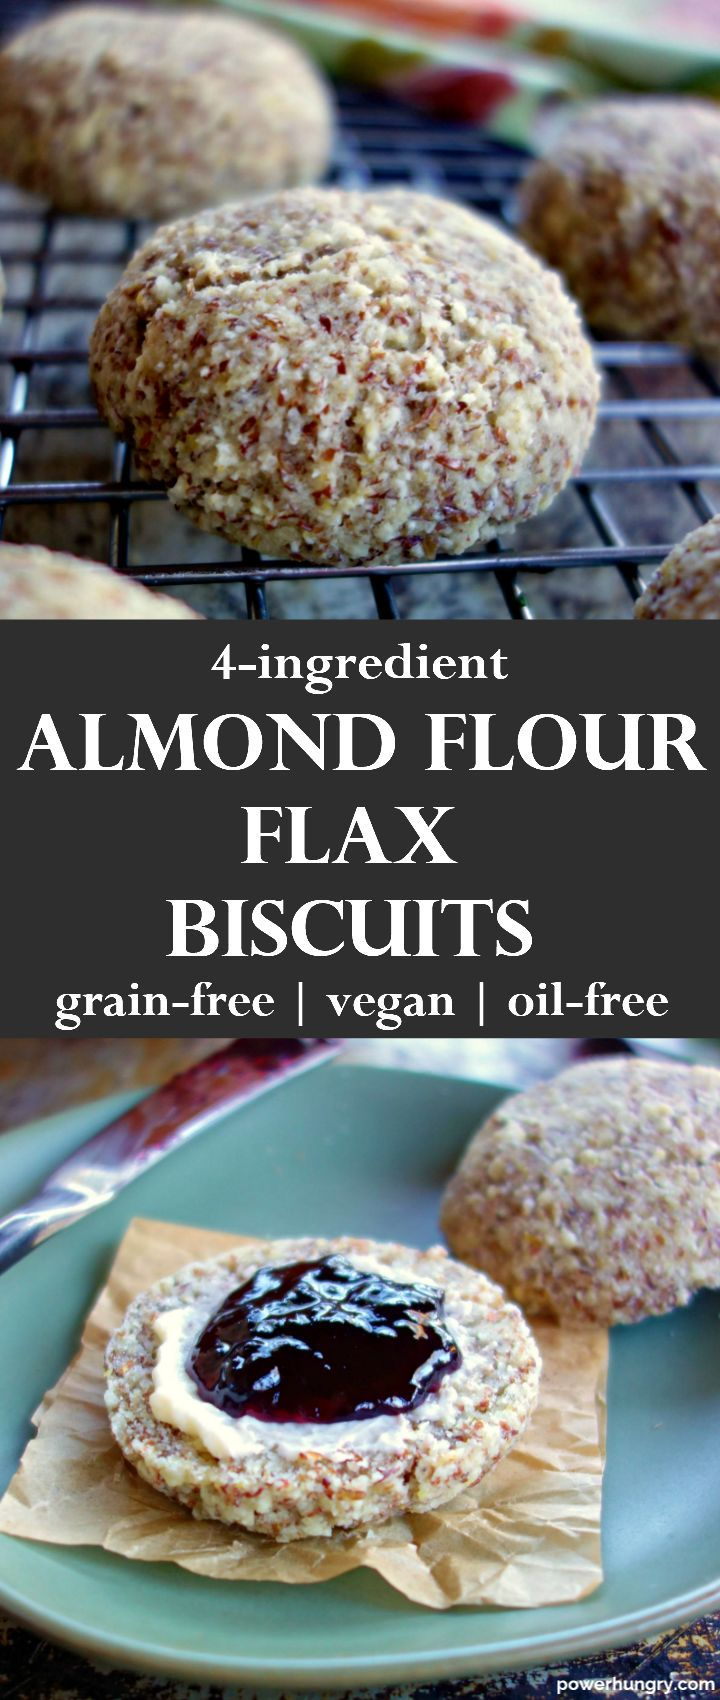 4-Ingredient Almond-Flax Biscuits {Grain-Free, Oil-Free,Vegan}